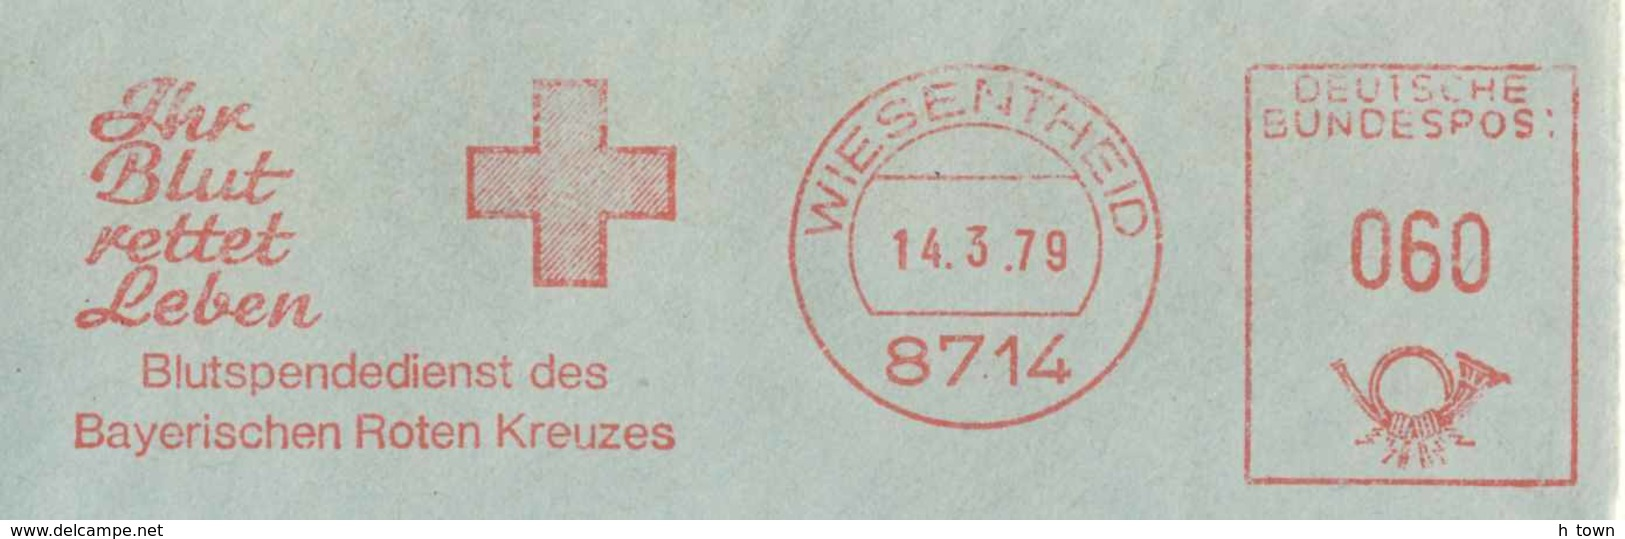 6209  Croix Rouge, Donneur De Sang: Ema D'Allemagne, 1979 -  Blood Donor, Red Cross  Meter Stamp From Germany - Rotes Kreuz